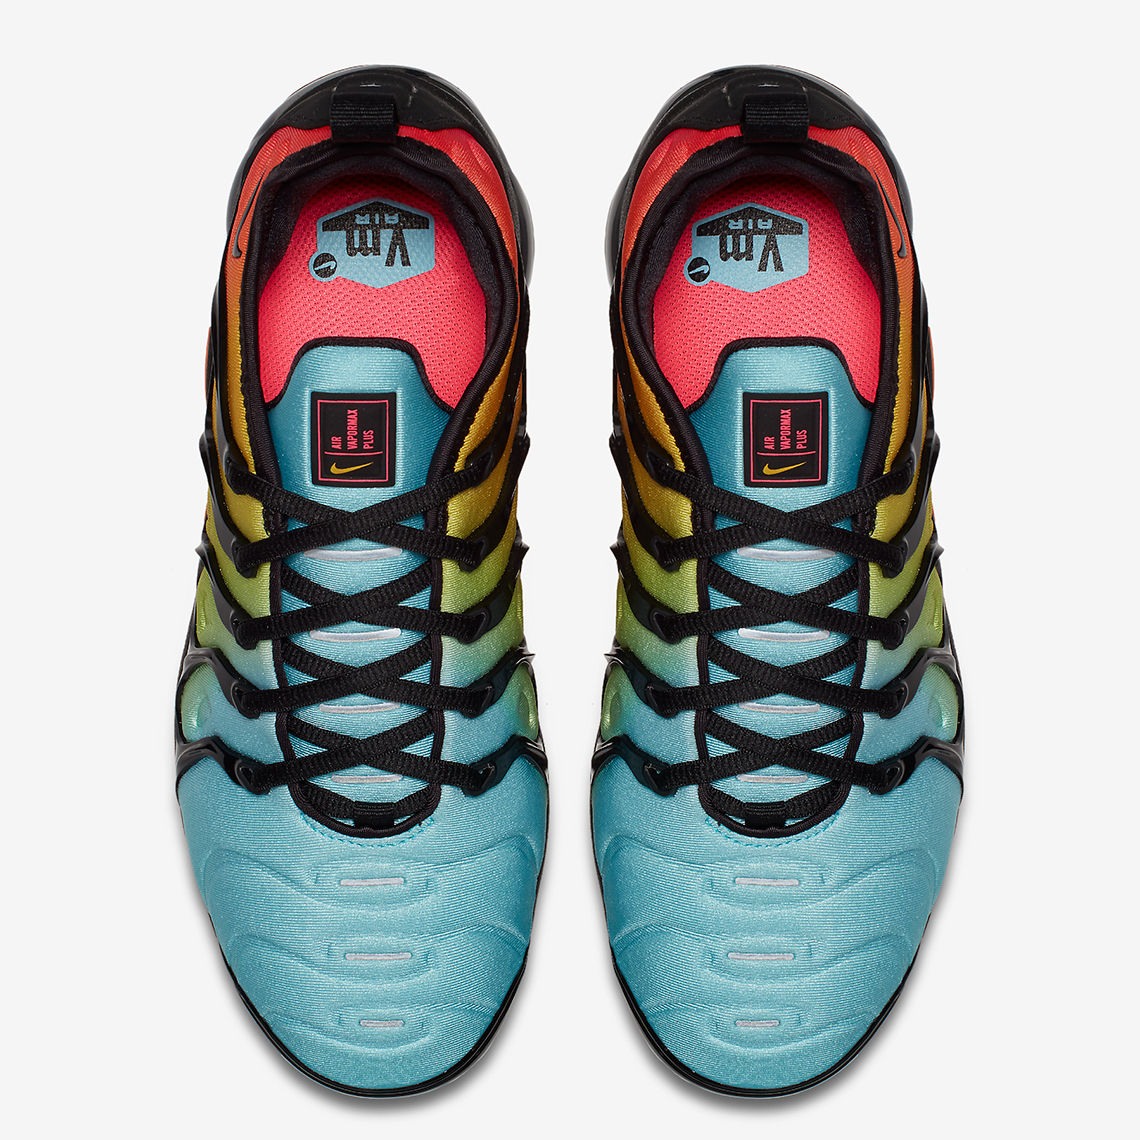 outlet store 052b2 cd036 ... Nike Vapeur Max Plus Coucher Du Soleil Tropical yobToXLf ...